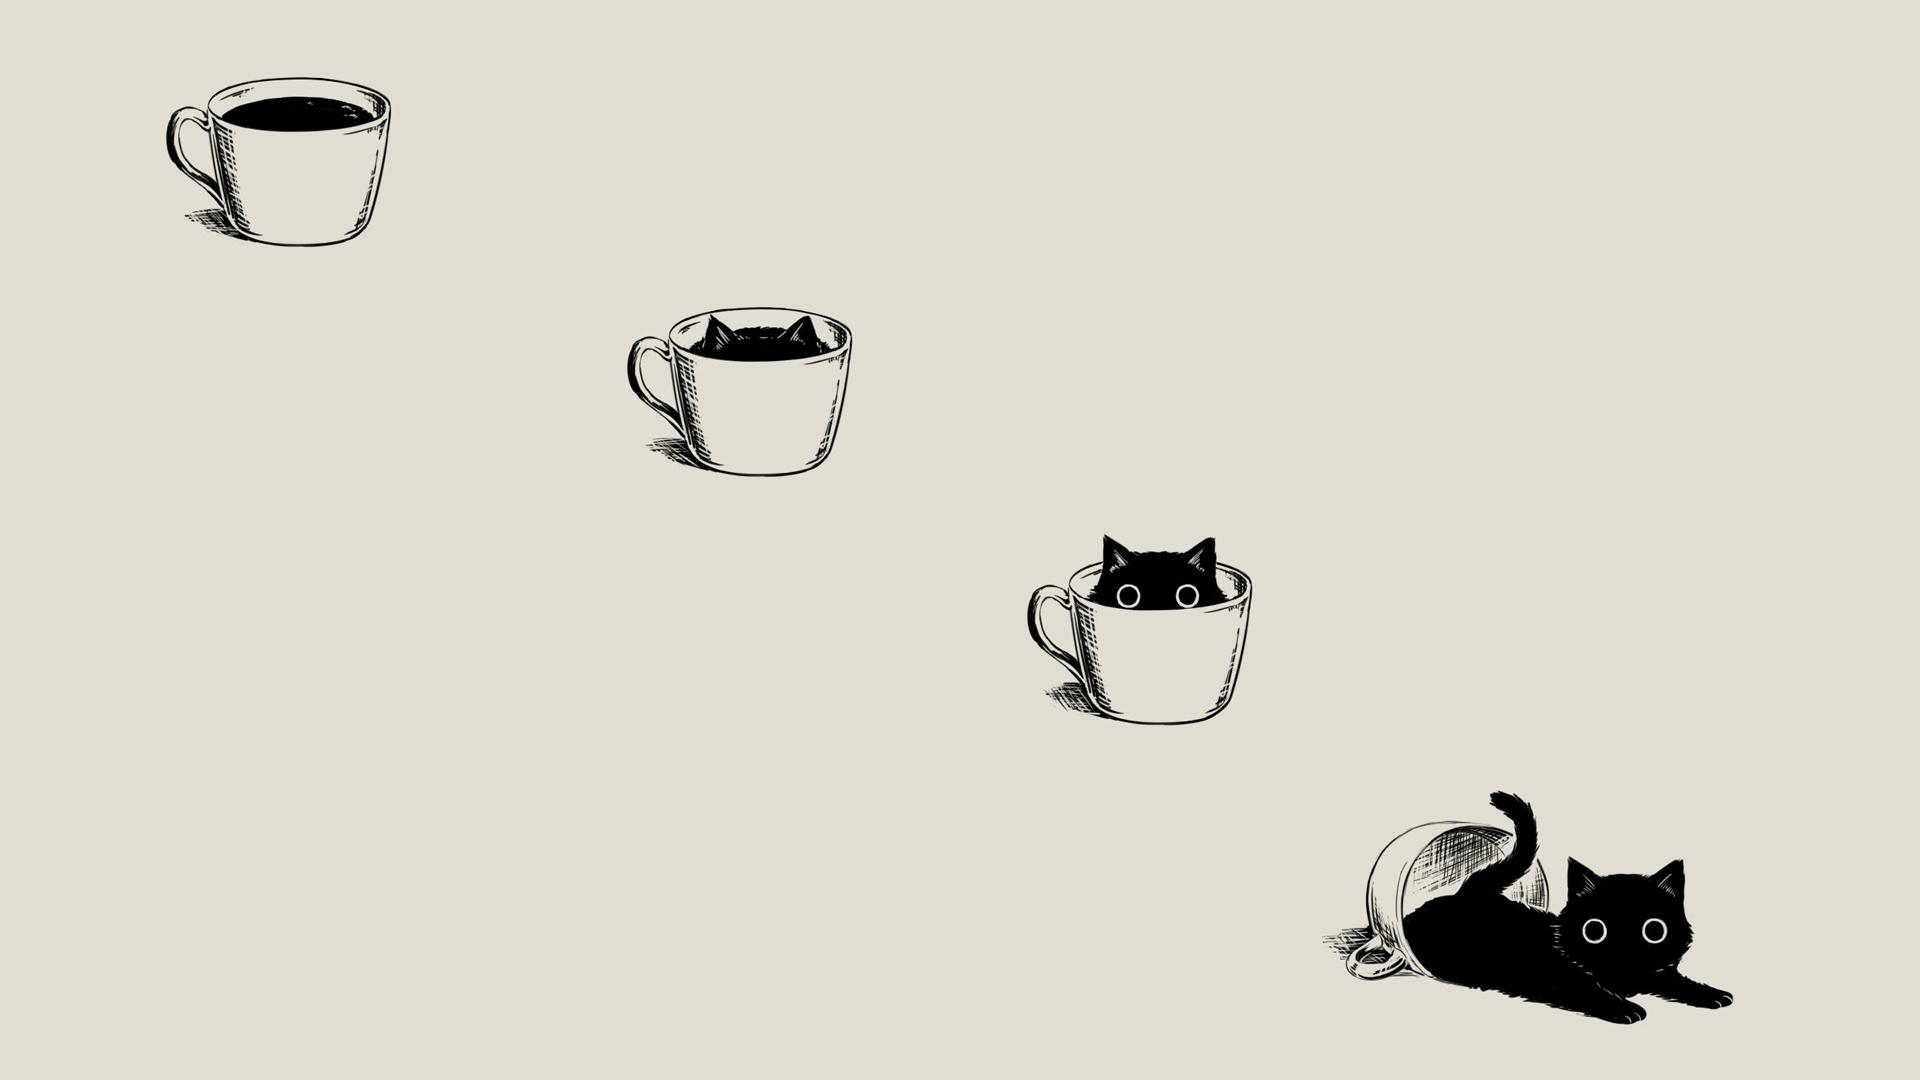 Minimalist Cat Wallpapers Top Free Minimalist Cat Backgrounds Wallpaperaccess